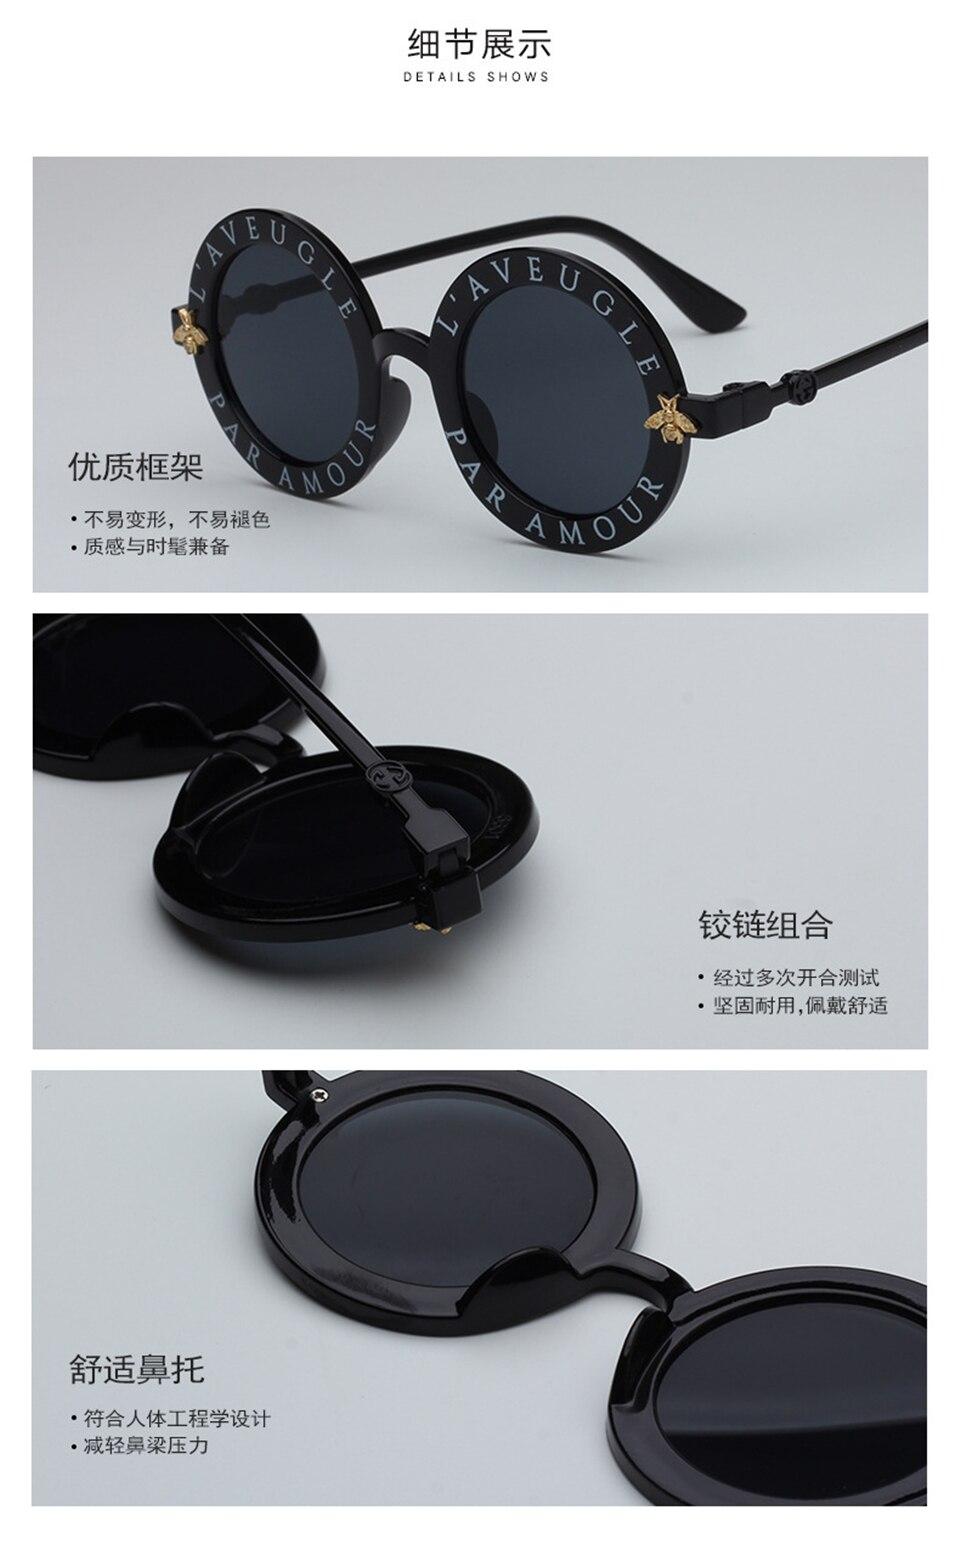 Steampunk Bee Kids Sunglasses Boys Girls Luxury Vintage Children Sunglasses Round Sun Glasses Oculos Feminino Accessories 12